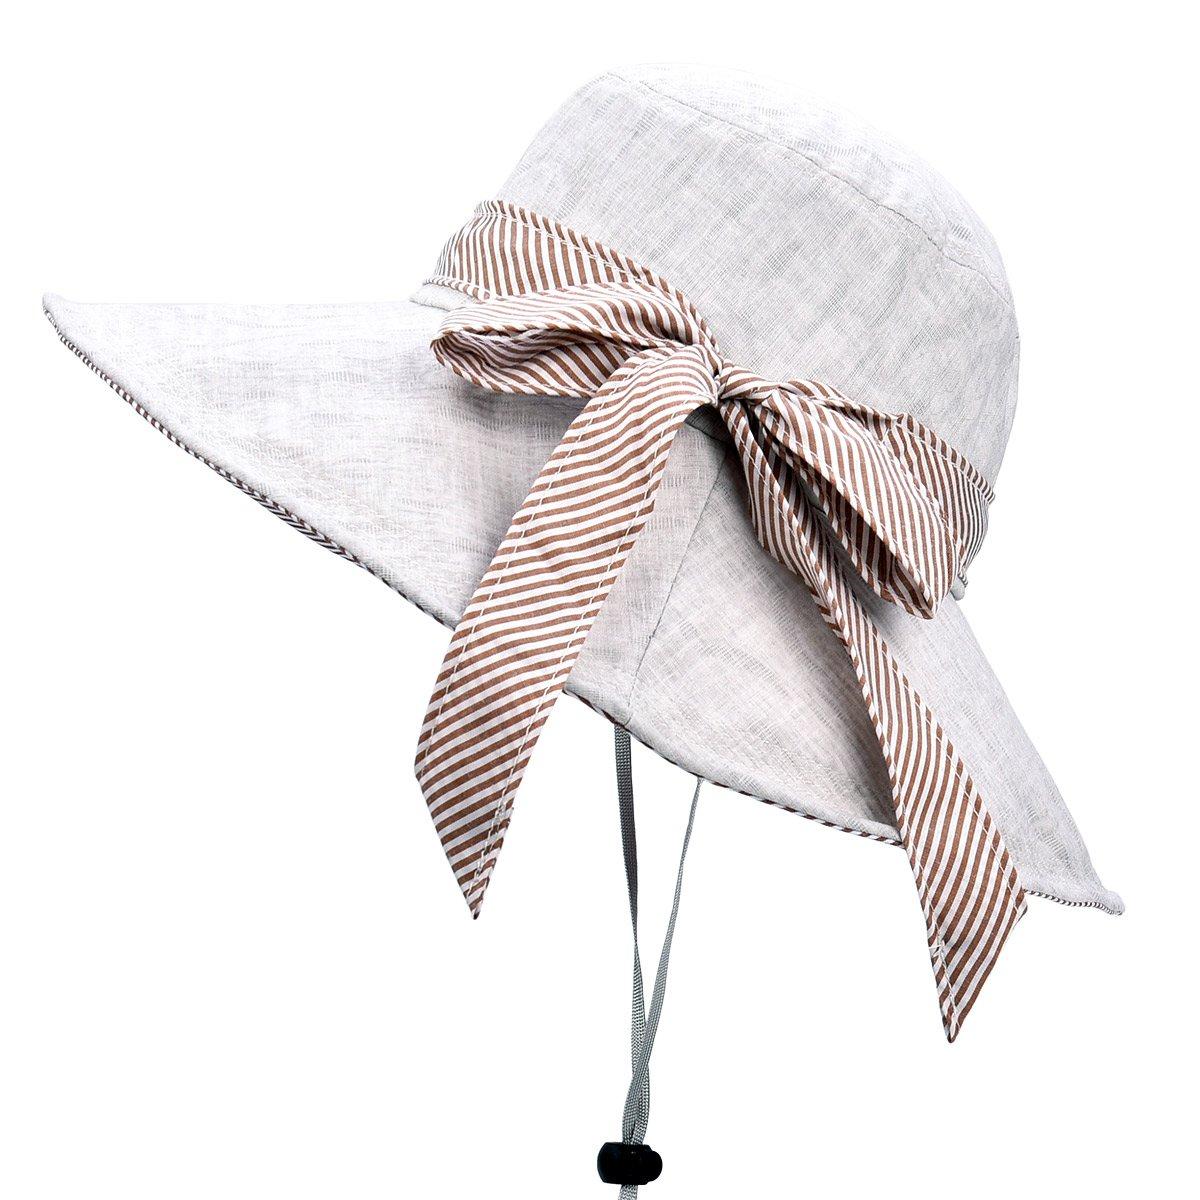 Sun Hats for Women Roll-up Wide Brim Summer Beach Hat Foldable Floppy Cotton Hat